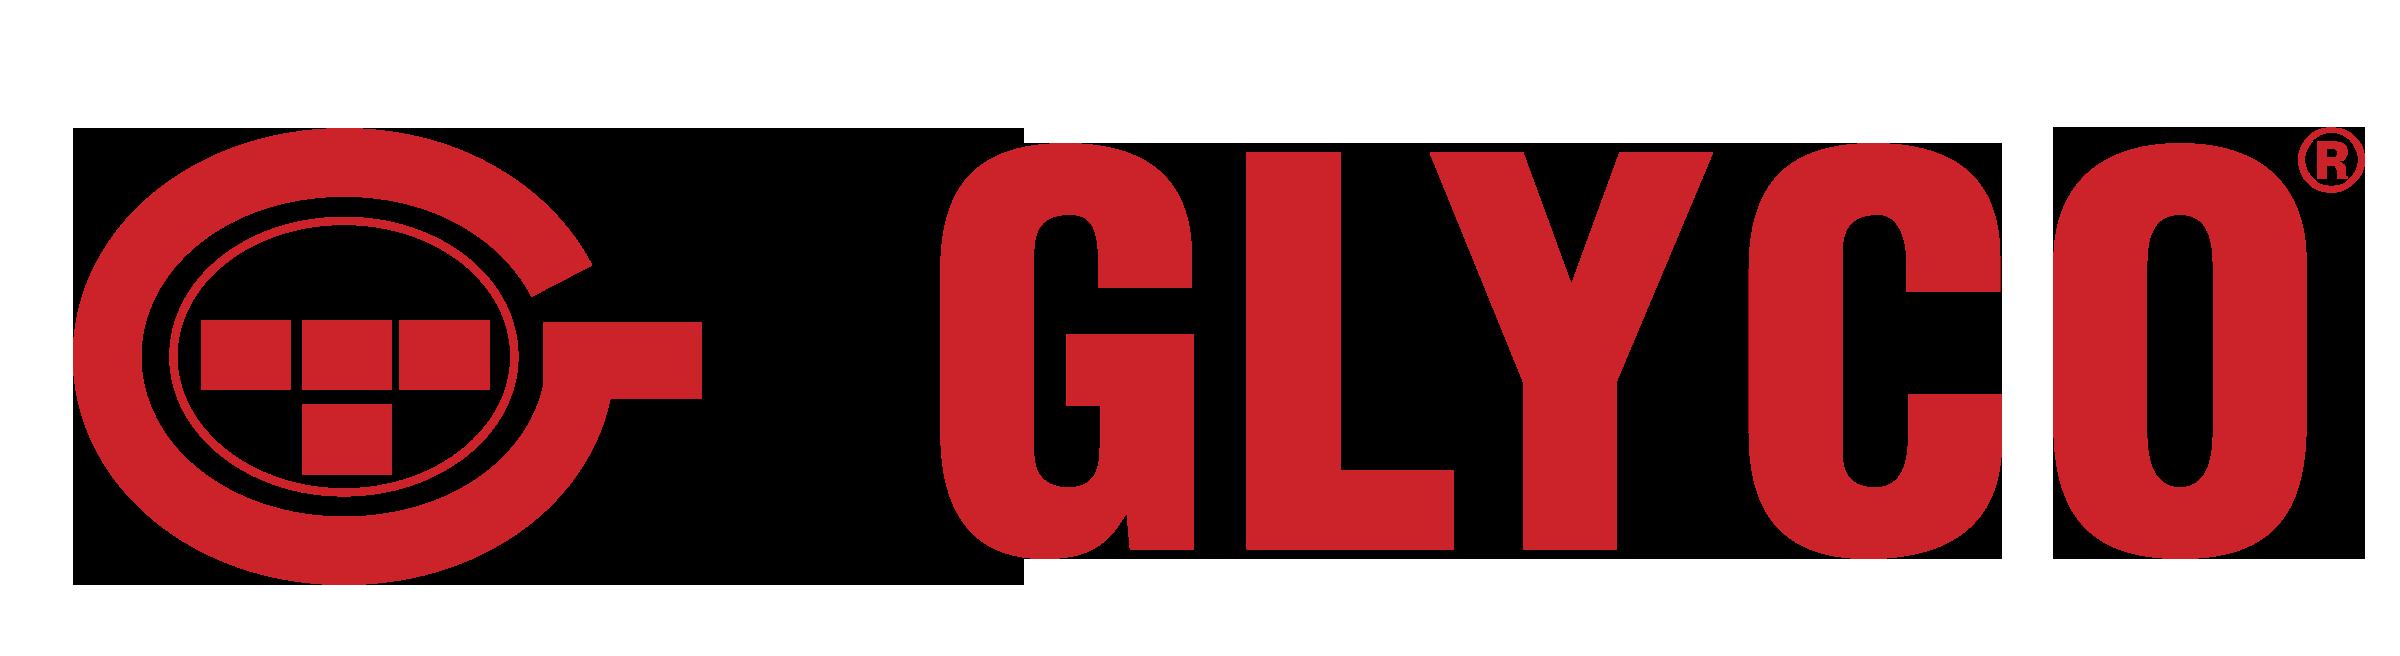 glyco-1-logo-png-transparent.png